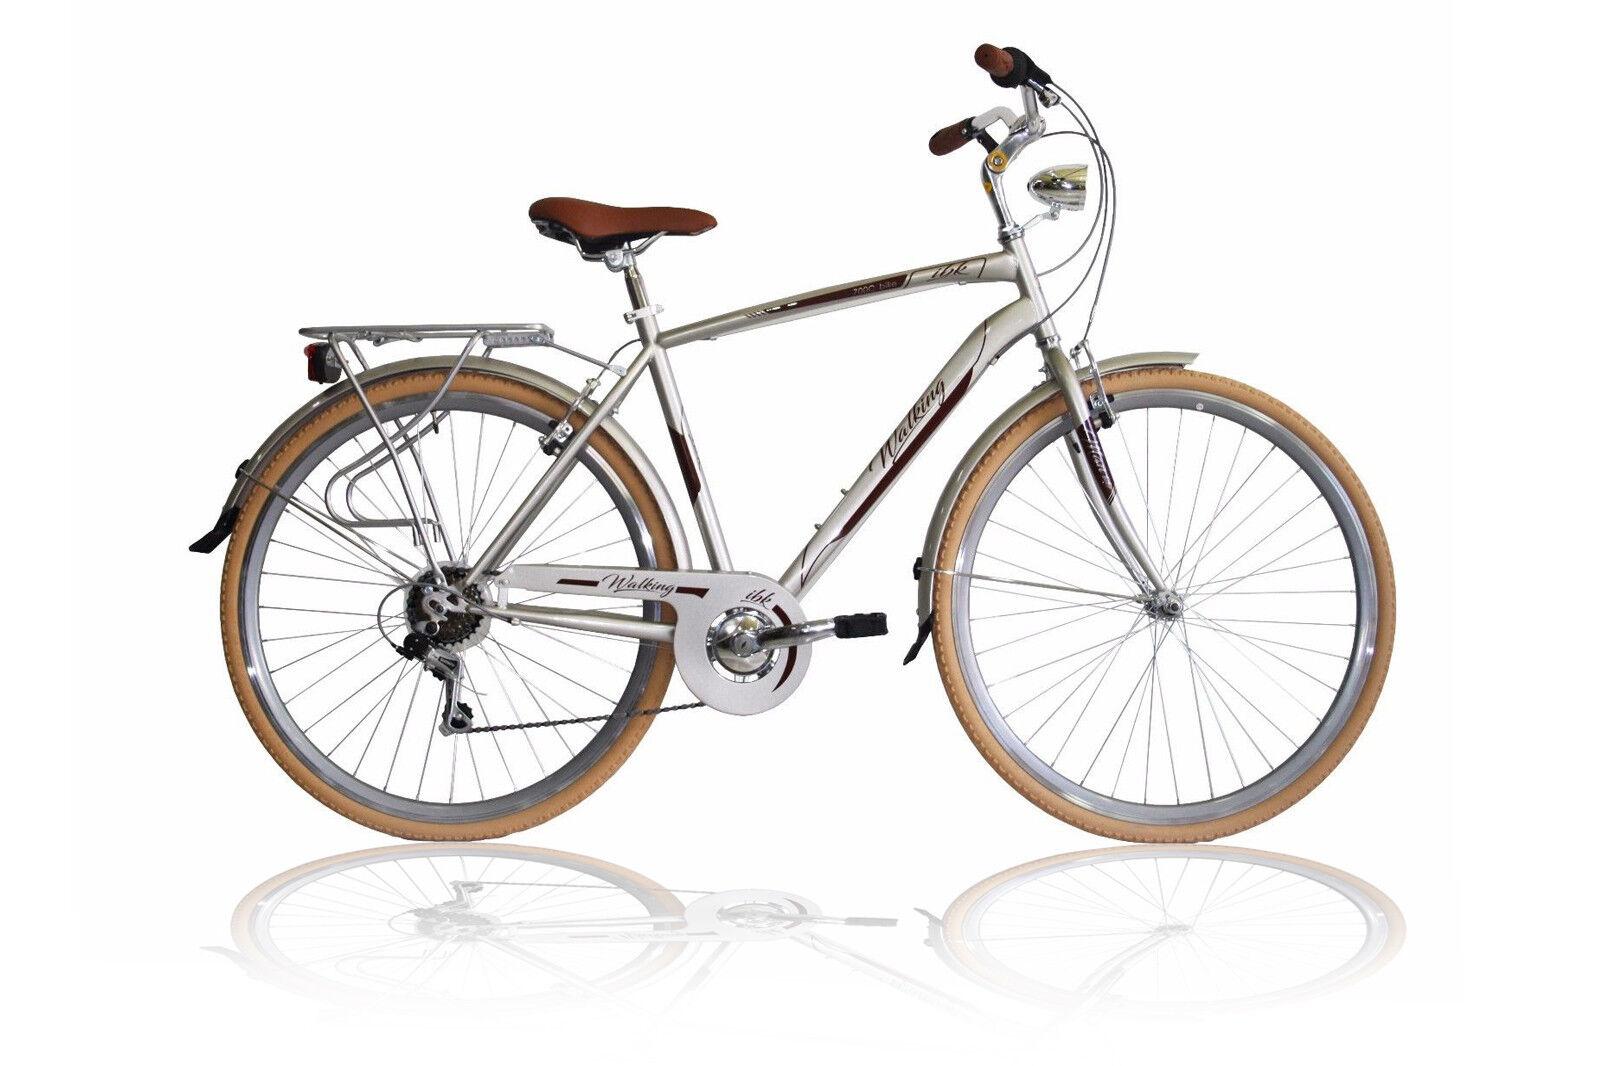 BICI TREKKING 28 CITY BIKE UOMO TELAIO ALLUMINIO CAMBIO SHIMANO 7V BICICLETTA